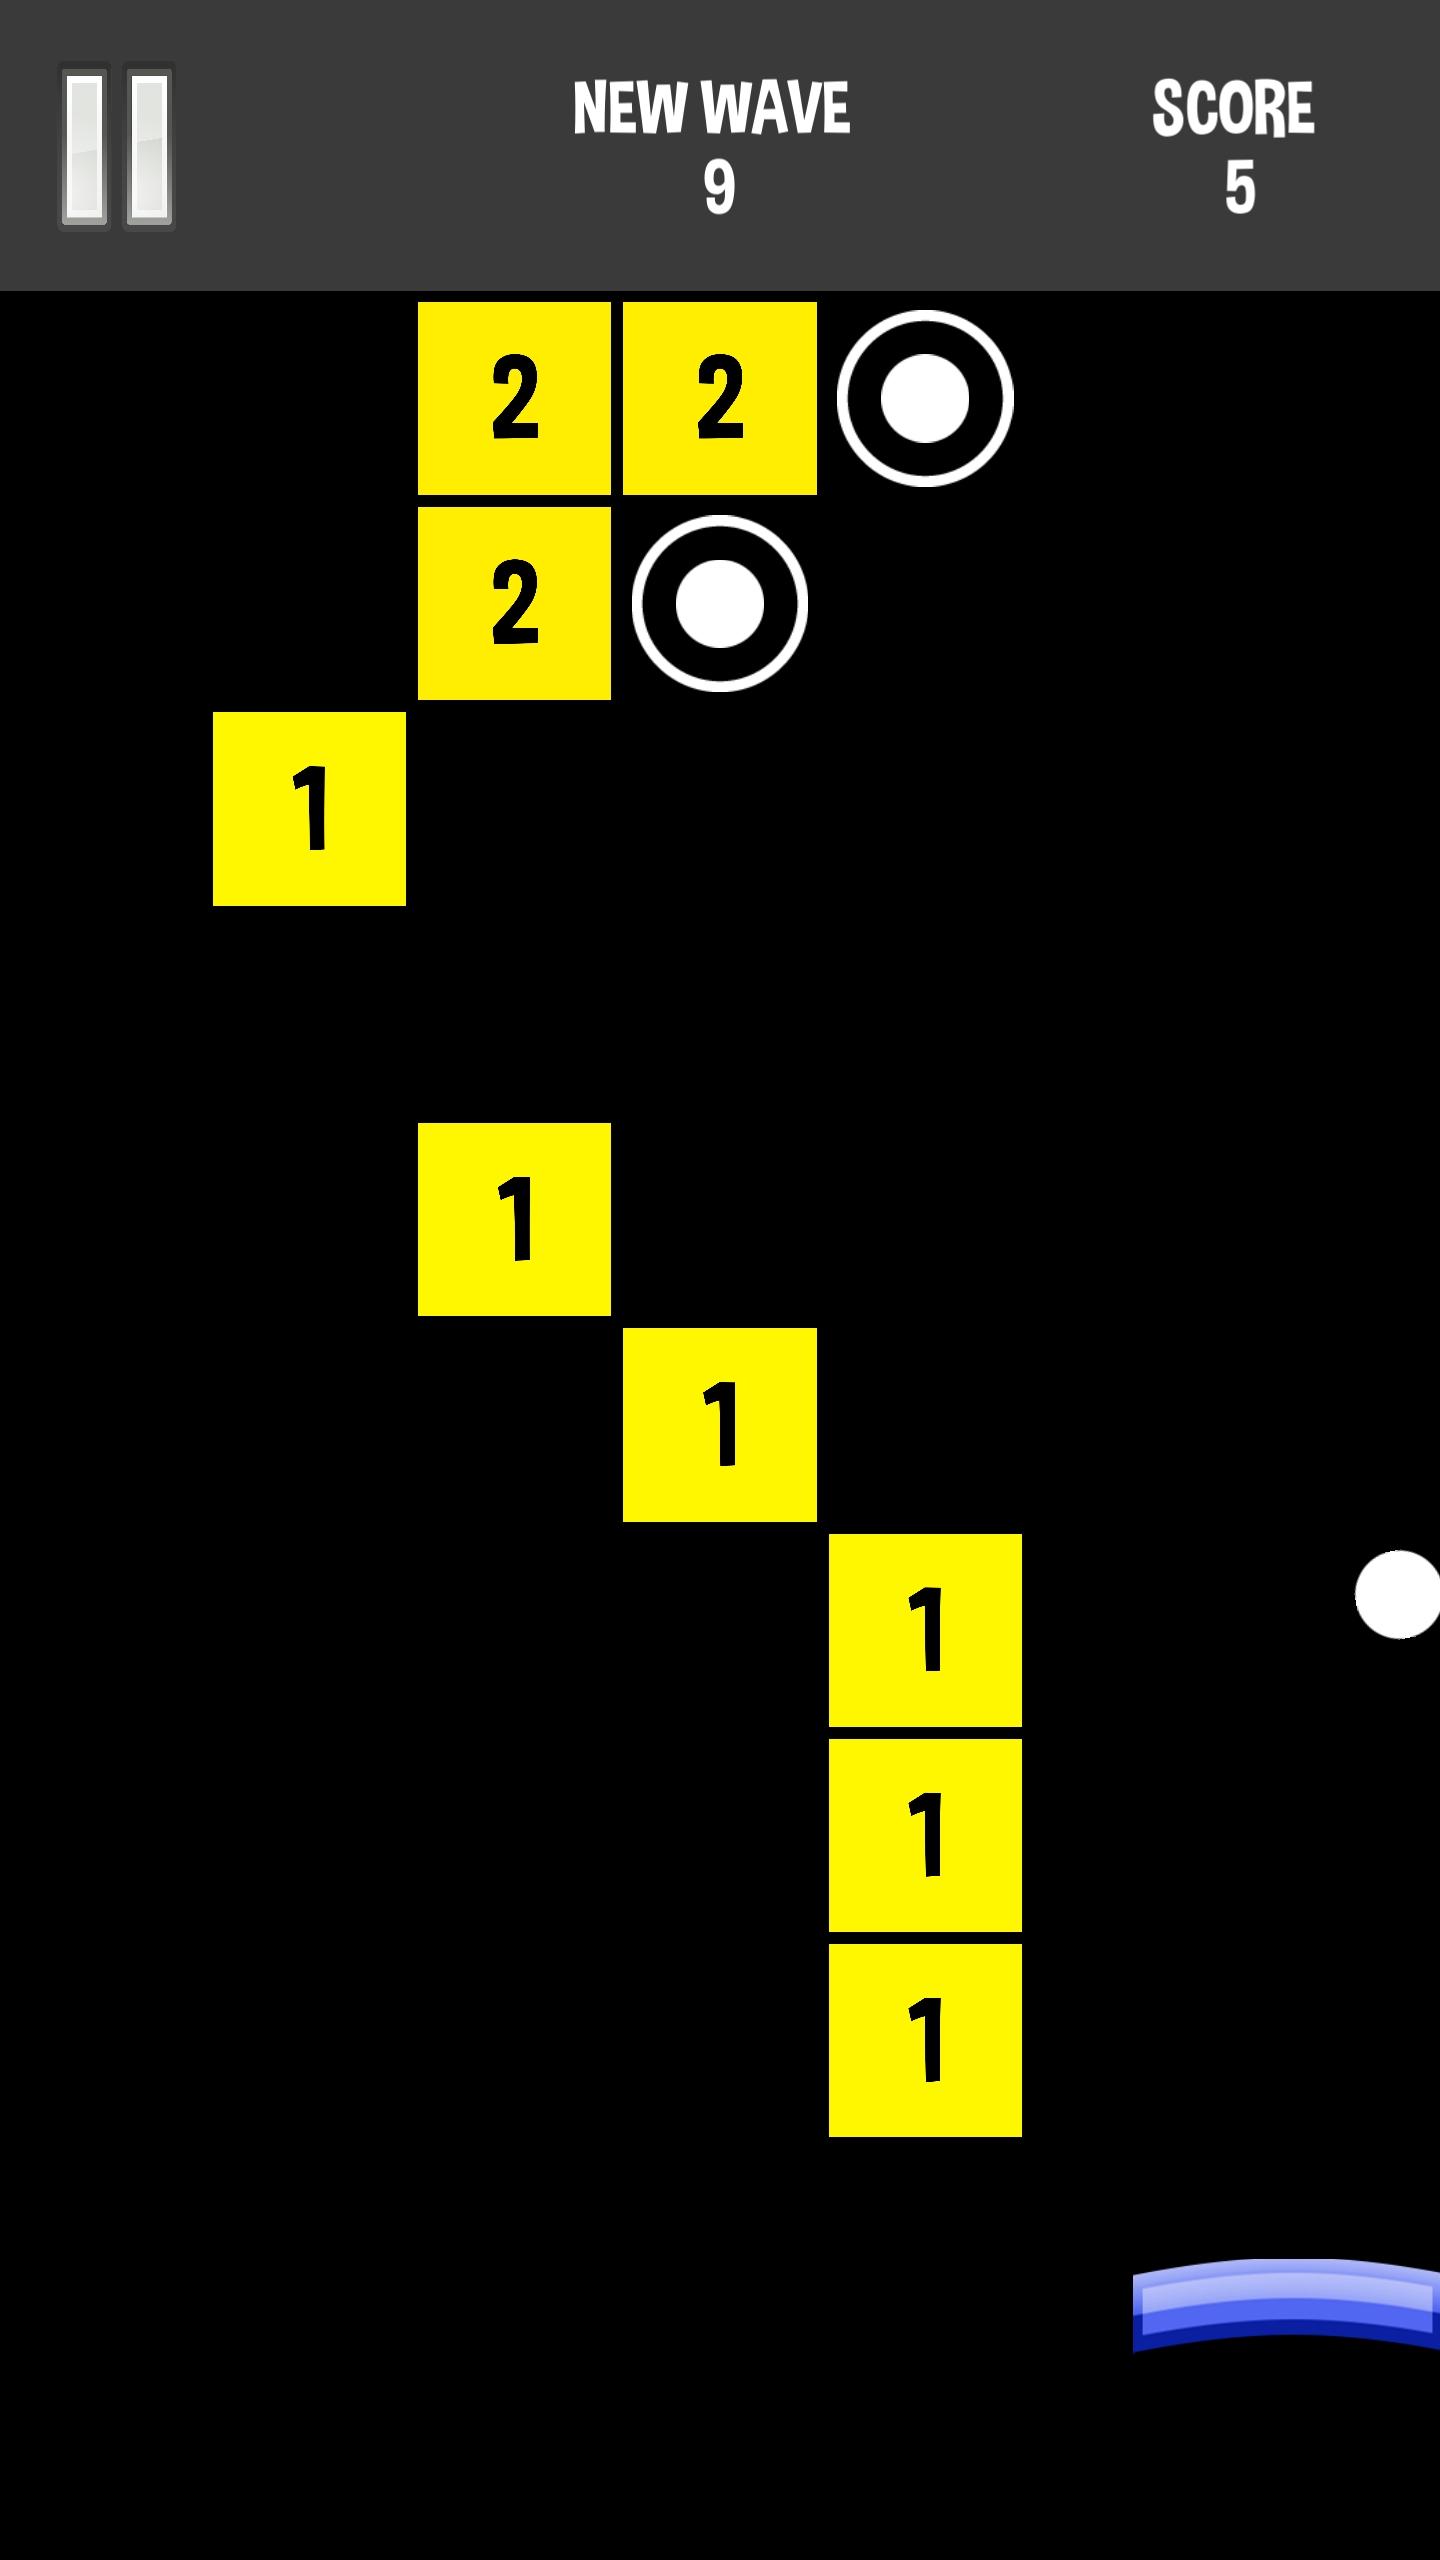 Infinite brick breaker arkanoid : endless balls  blocks crushing - complete project - ready for release